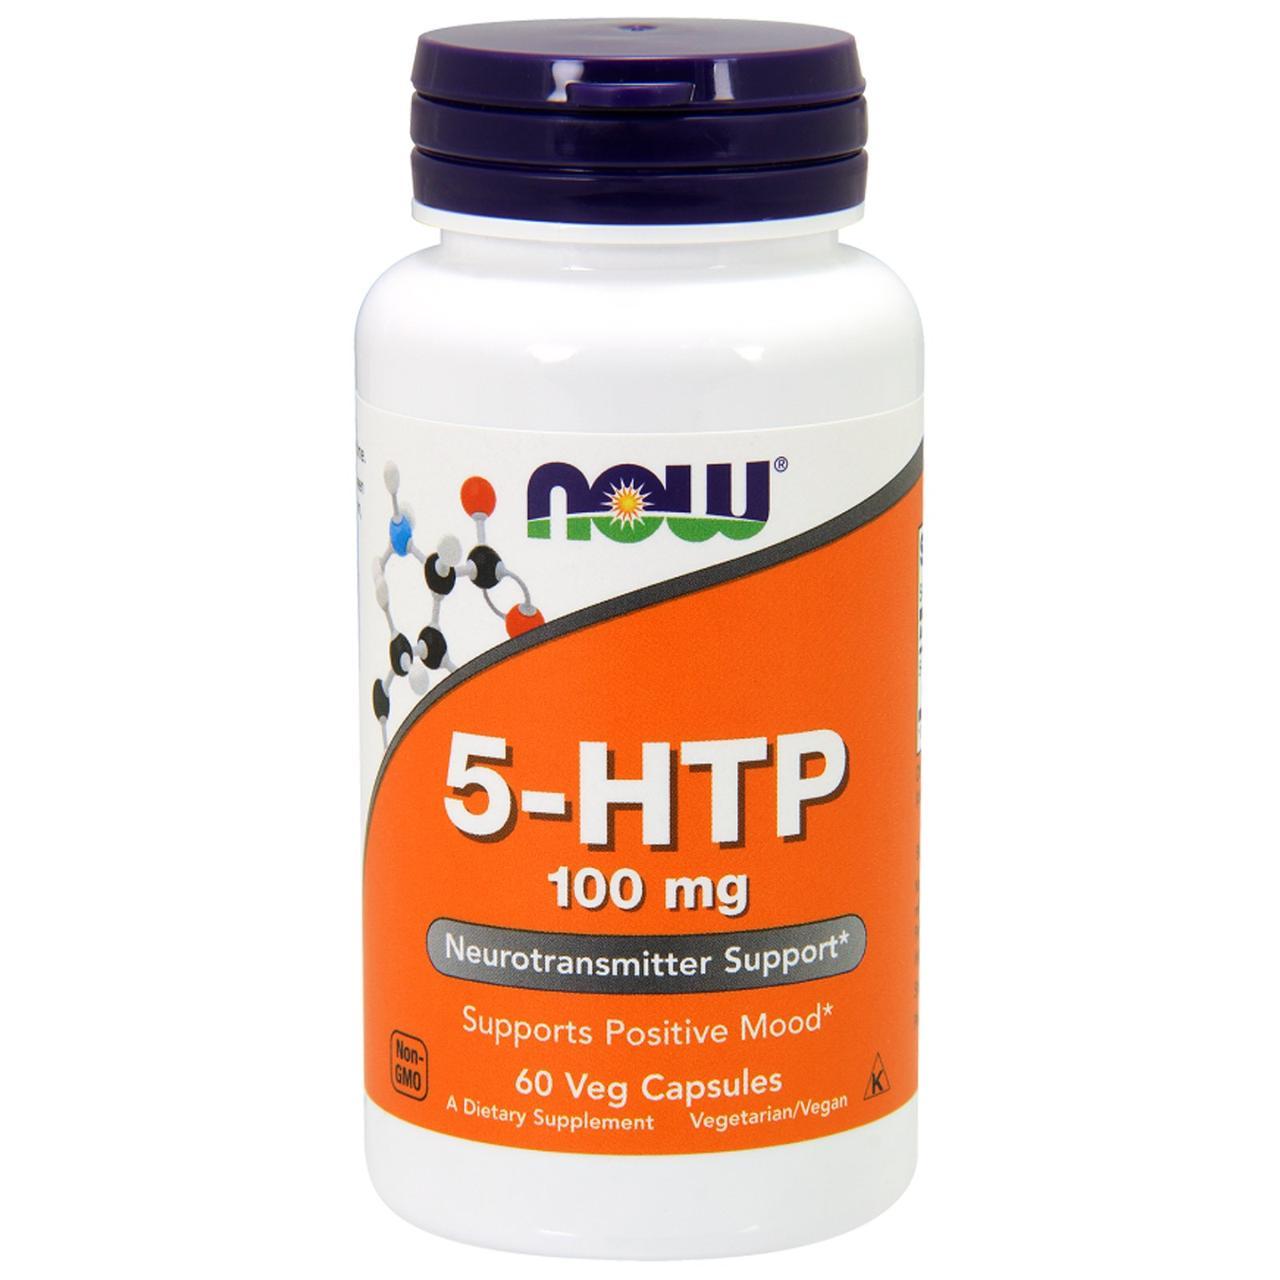 5-HTP (Гидрокситриптофан) 100мг, Now Foods, 60 вегетарианских капсул